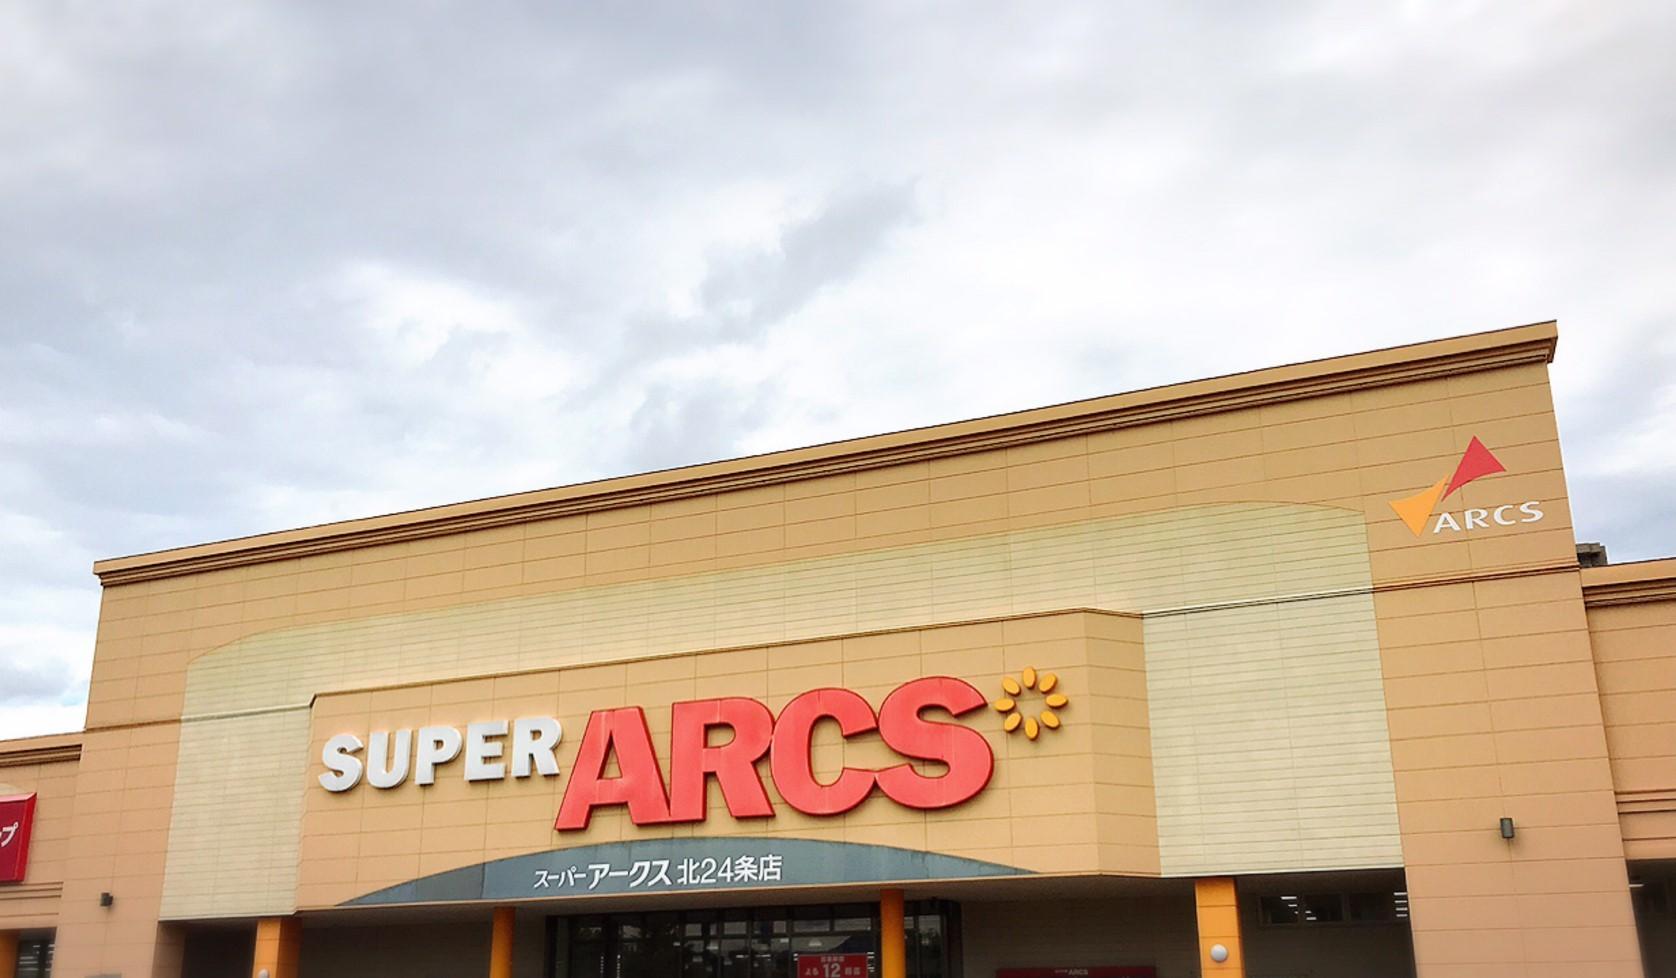 SUPER ARCS/札幌市 北区_c0378174_18341469.jpg